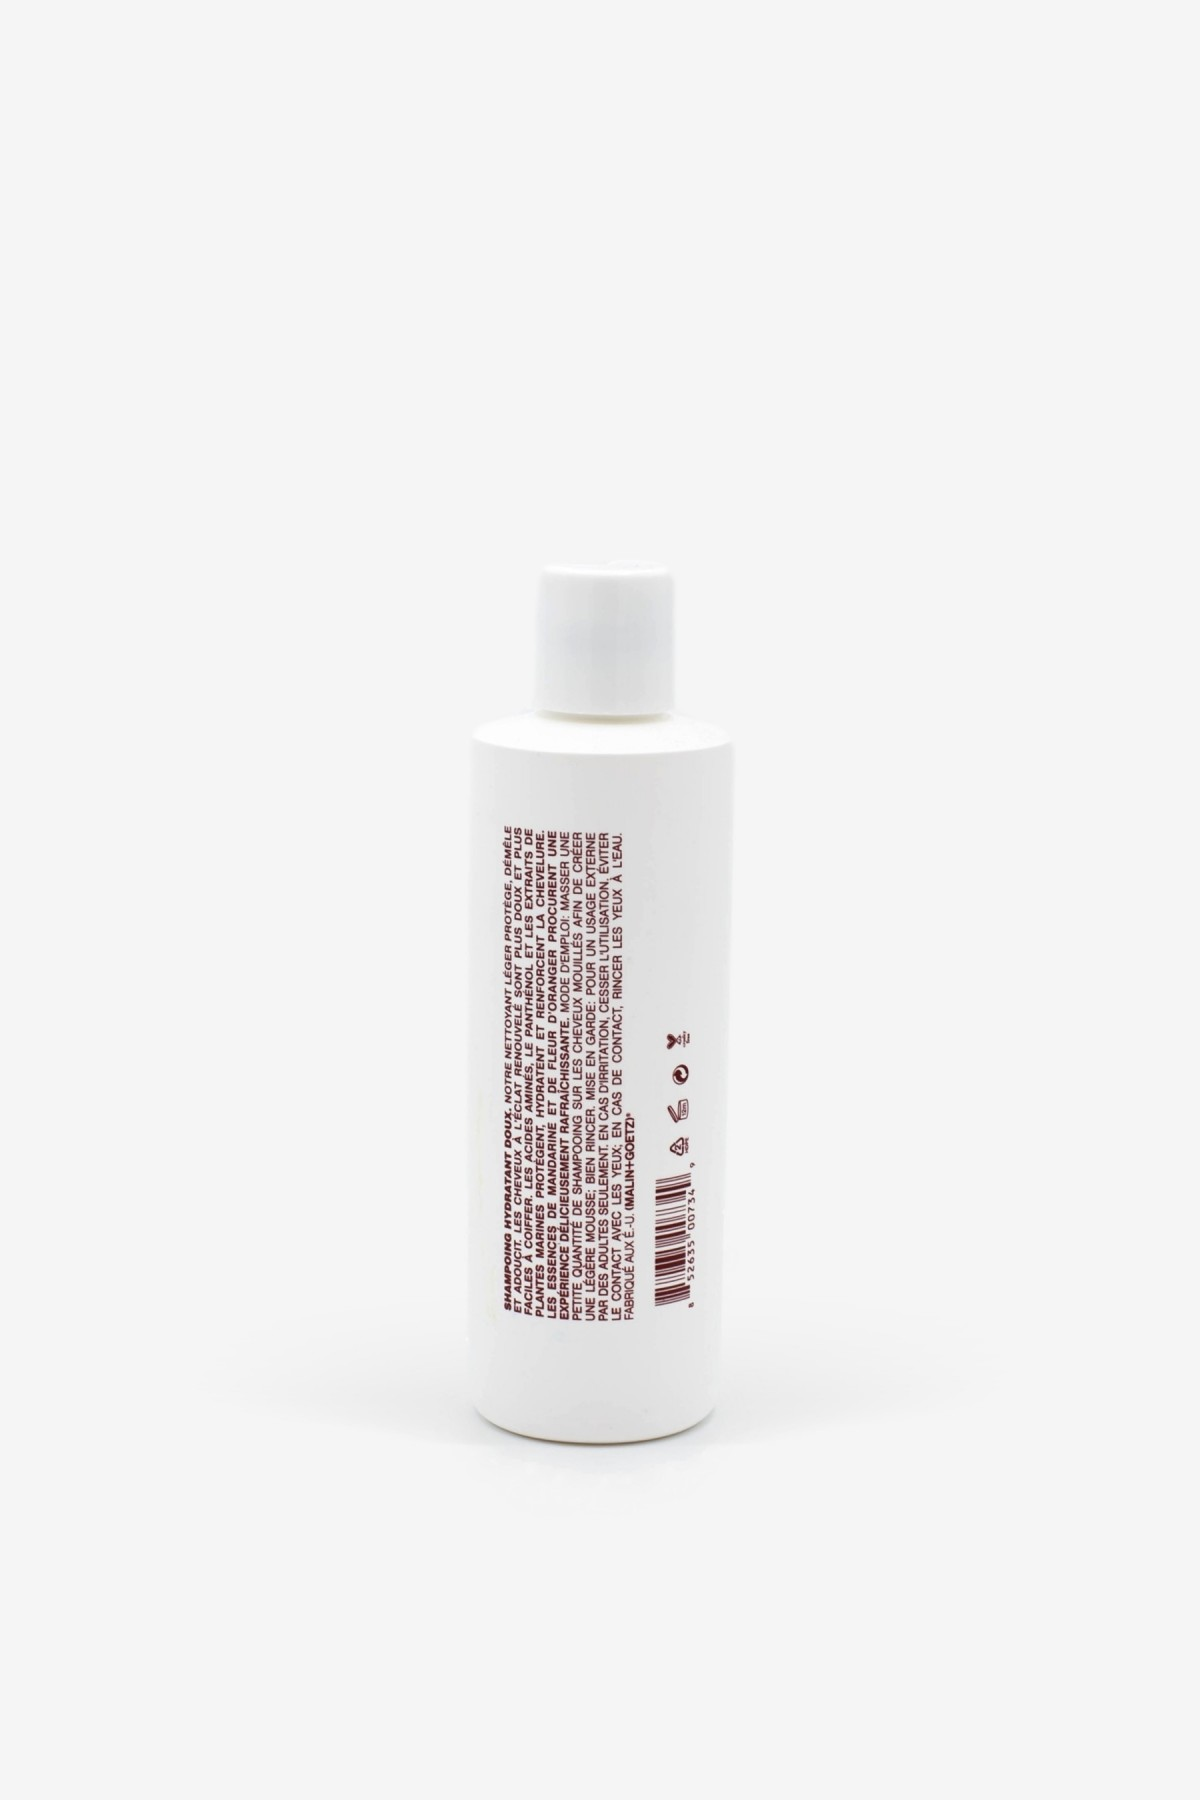 Malin+Goetz Gentle Hydrating Shampoo 236ml in